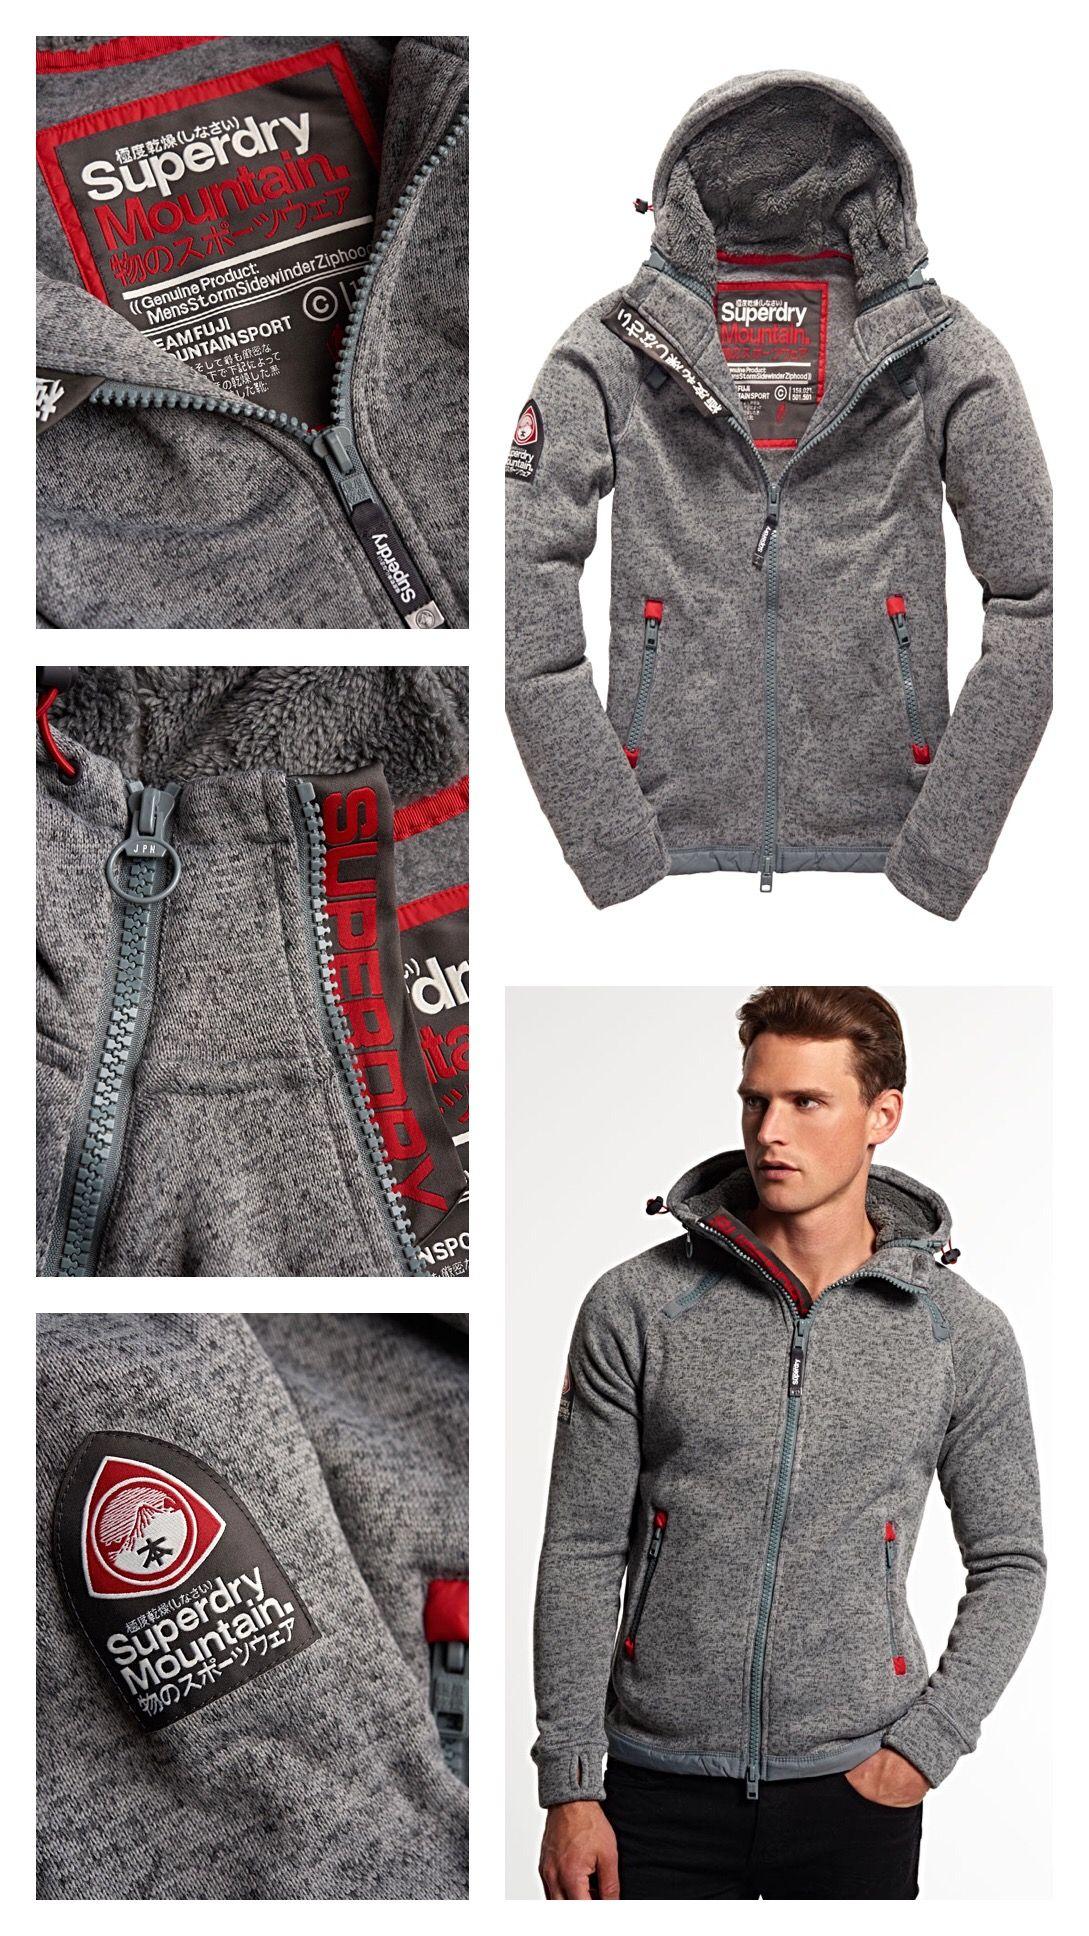 72be14b977ebf SUPERDRY Storm Sideward Zip Hoodie   Men Fashion Styles - Outfits ...